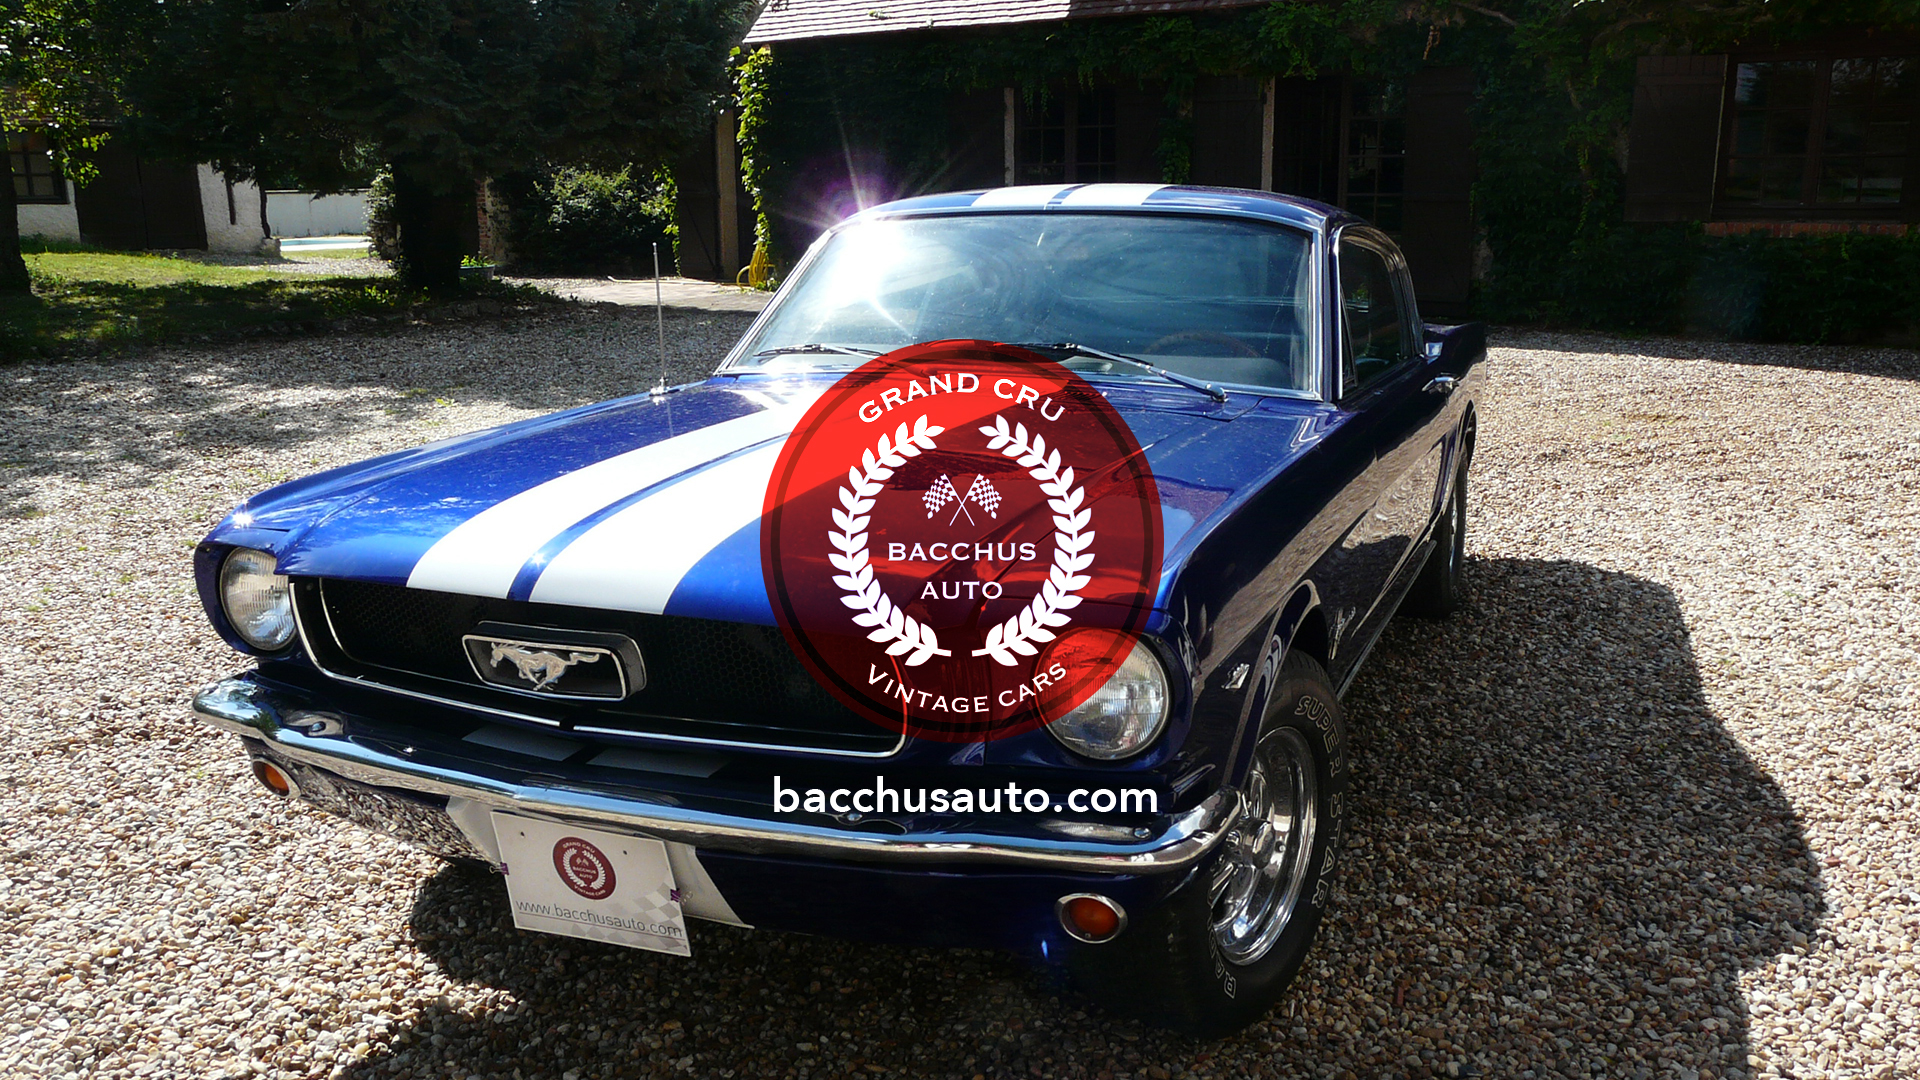 1965 FORD MUSTANG FASTBACK 289 V8 (27)